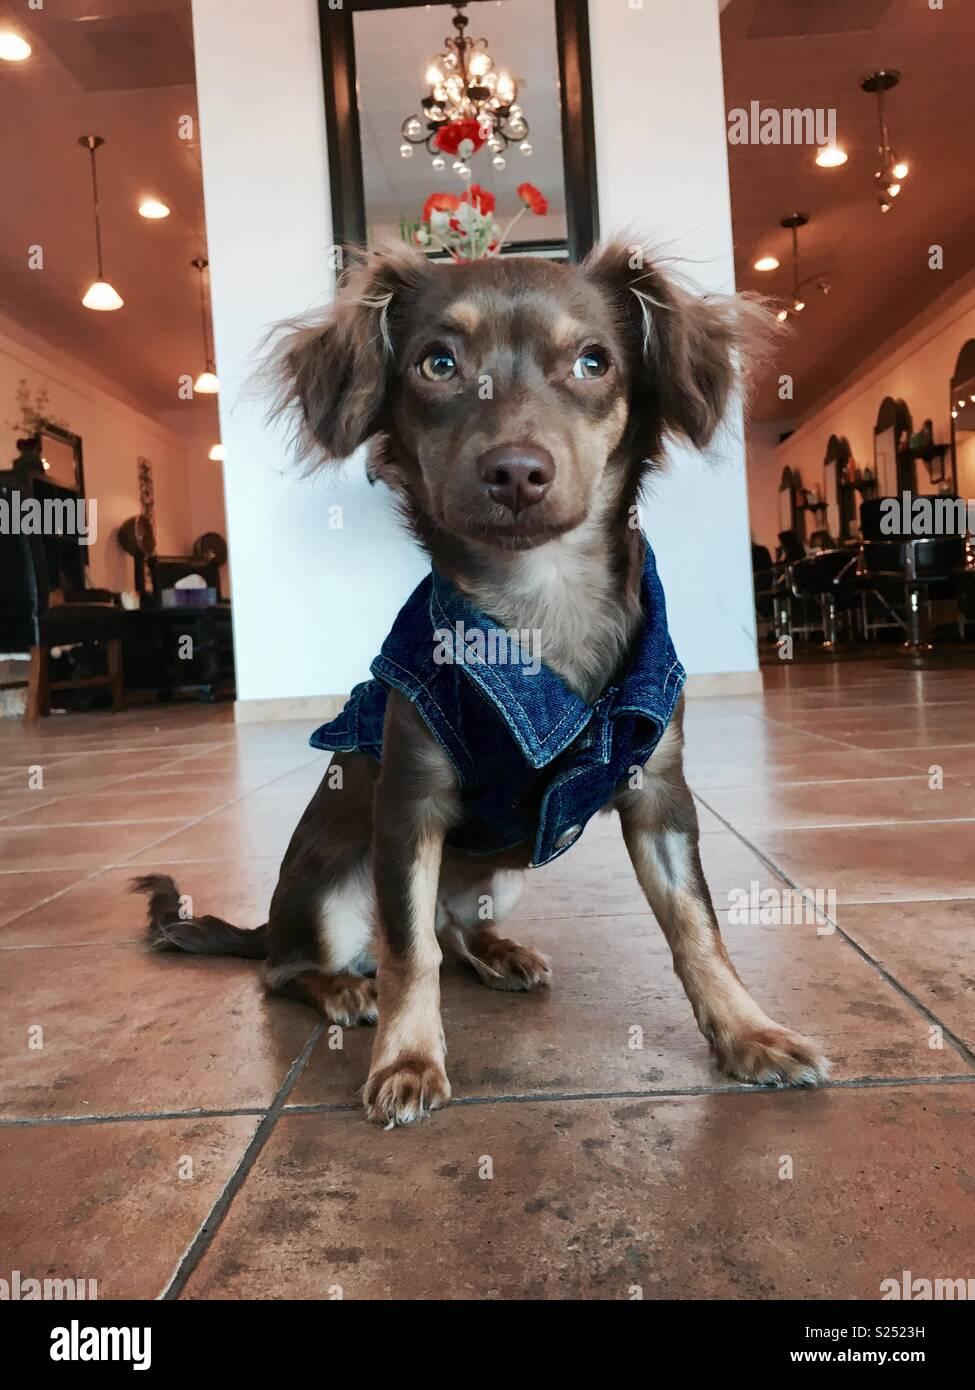 Dapper Dog - Stock Image